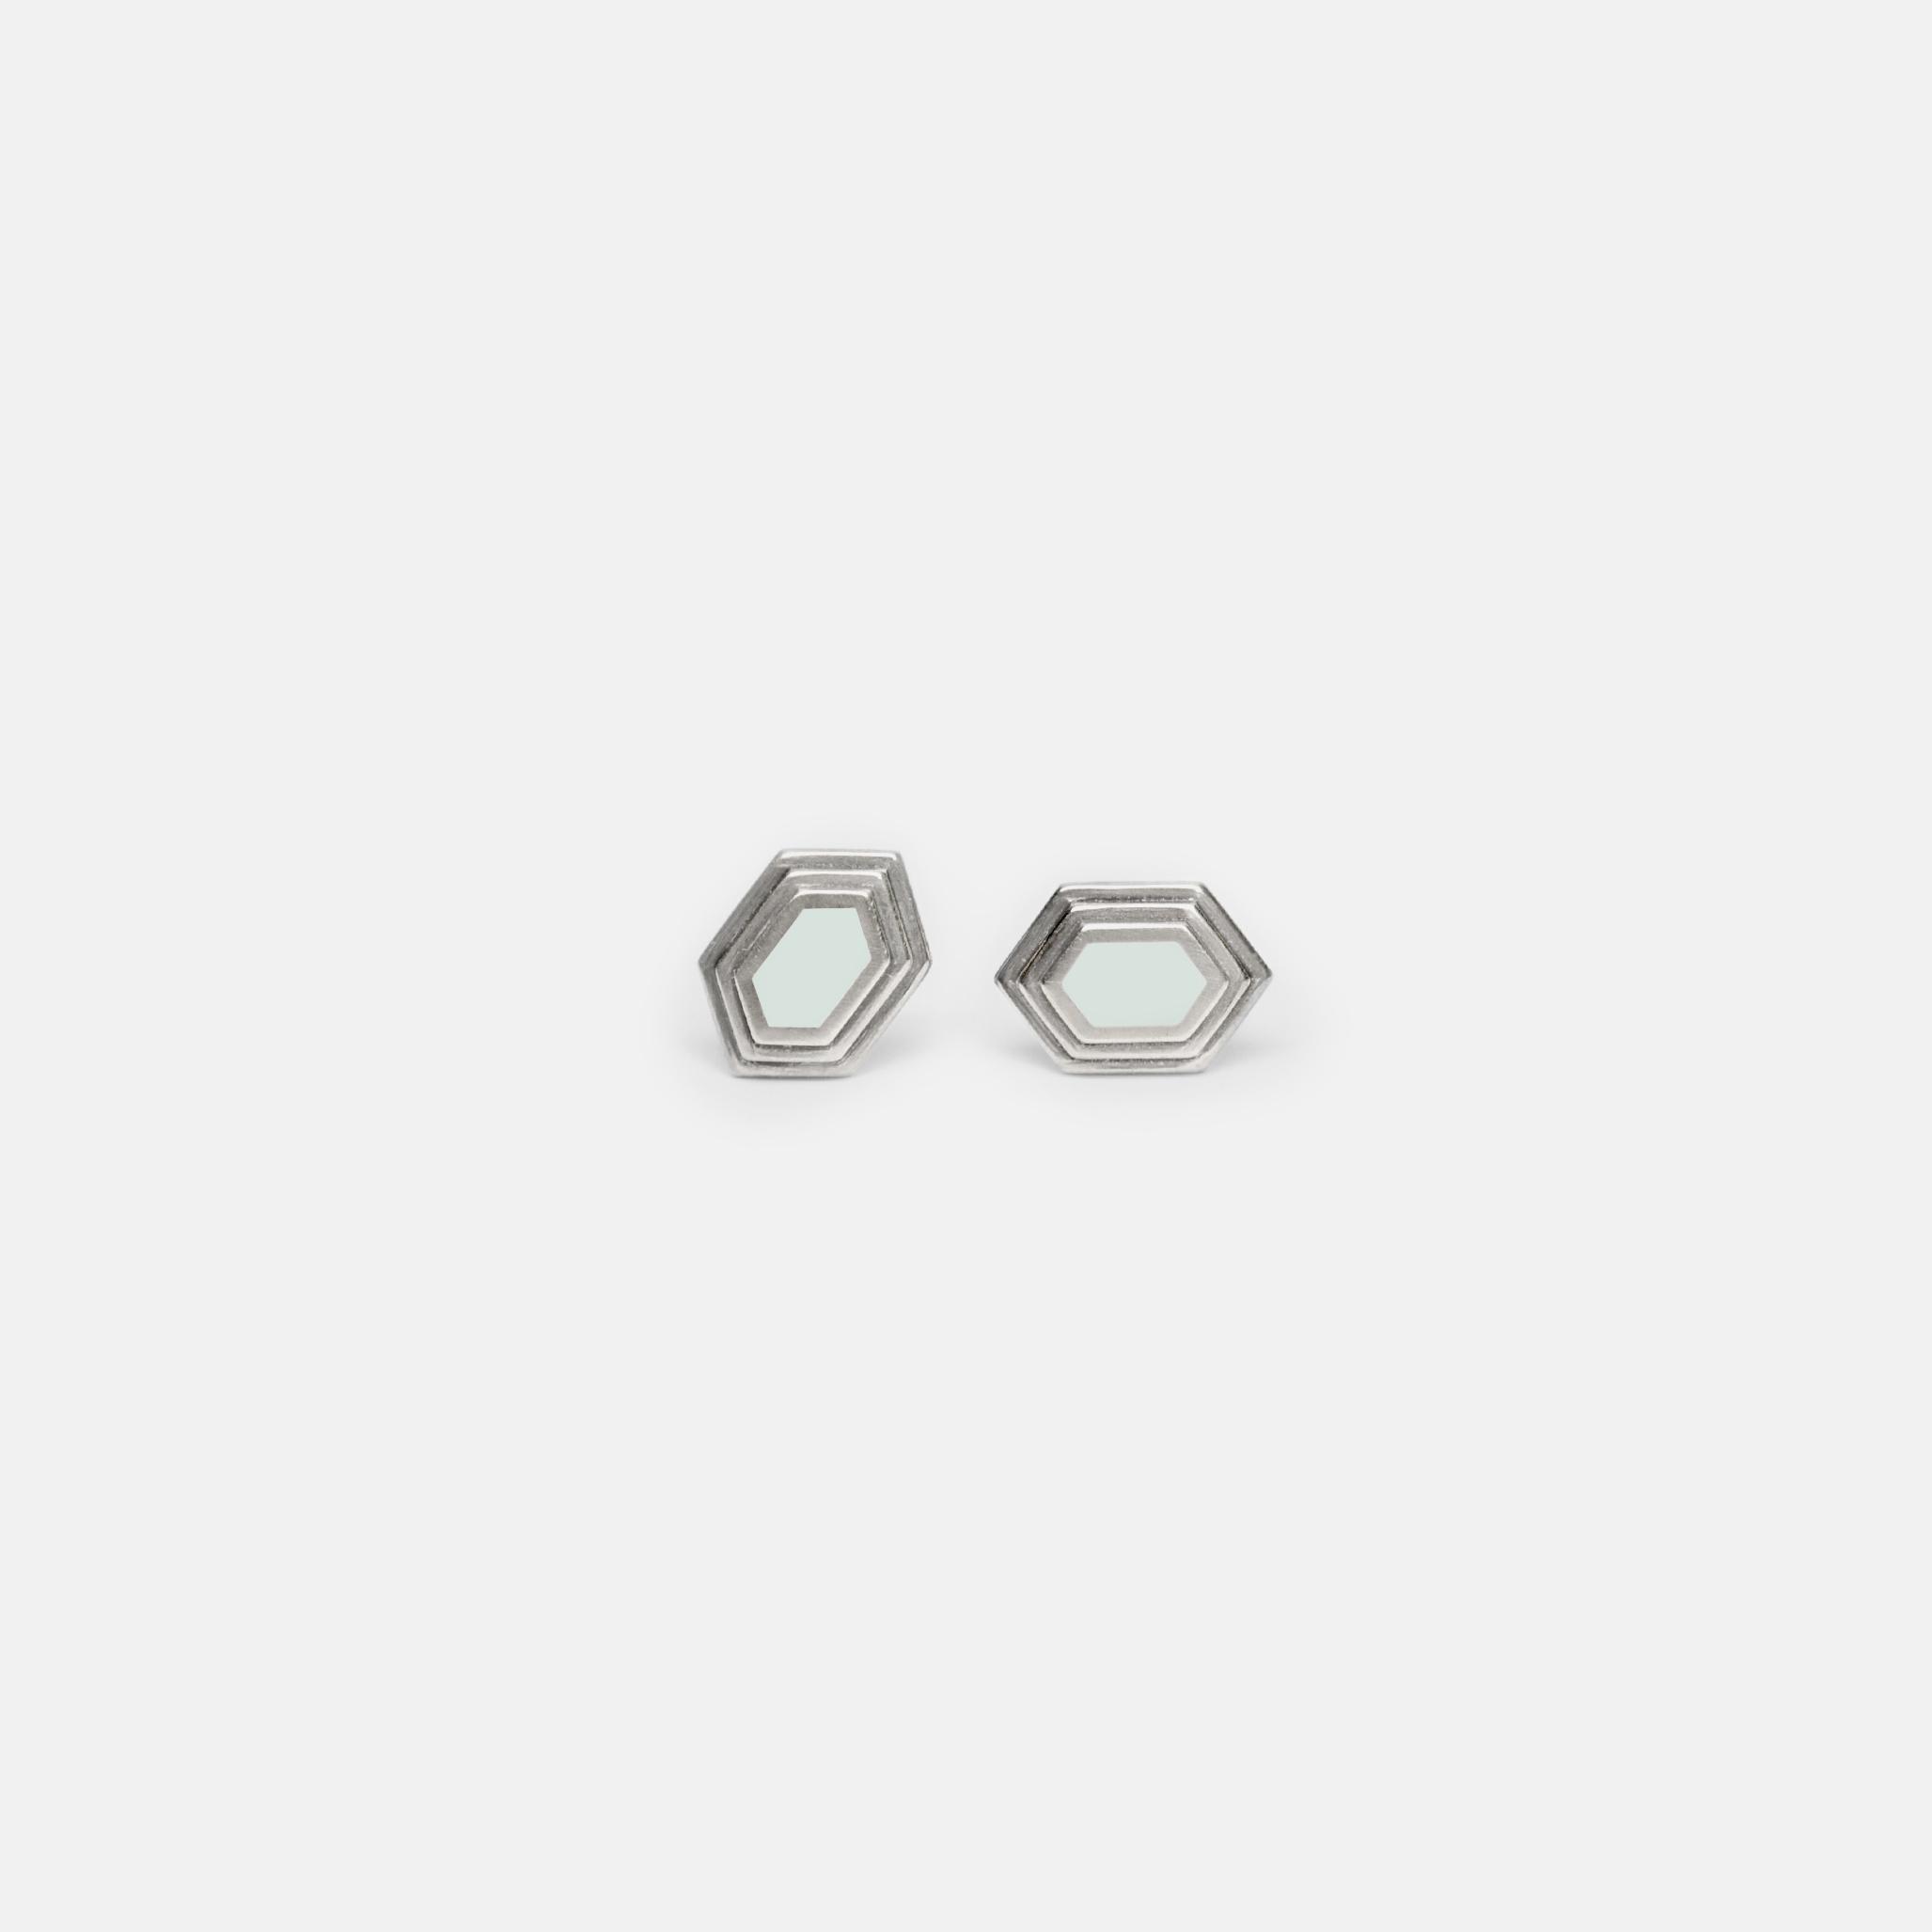 Off_White_Marisa_Lomonaco_Stepped_Stud_Earring_0004_Silver_Mint.jpg